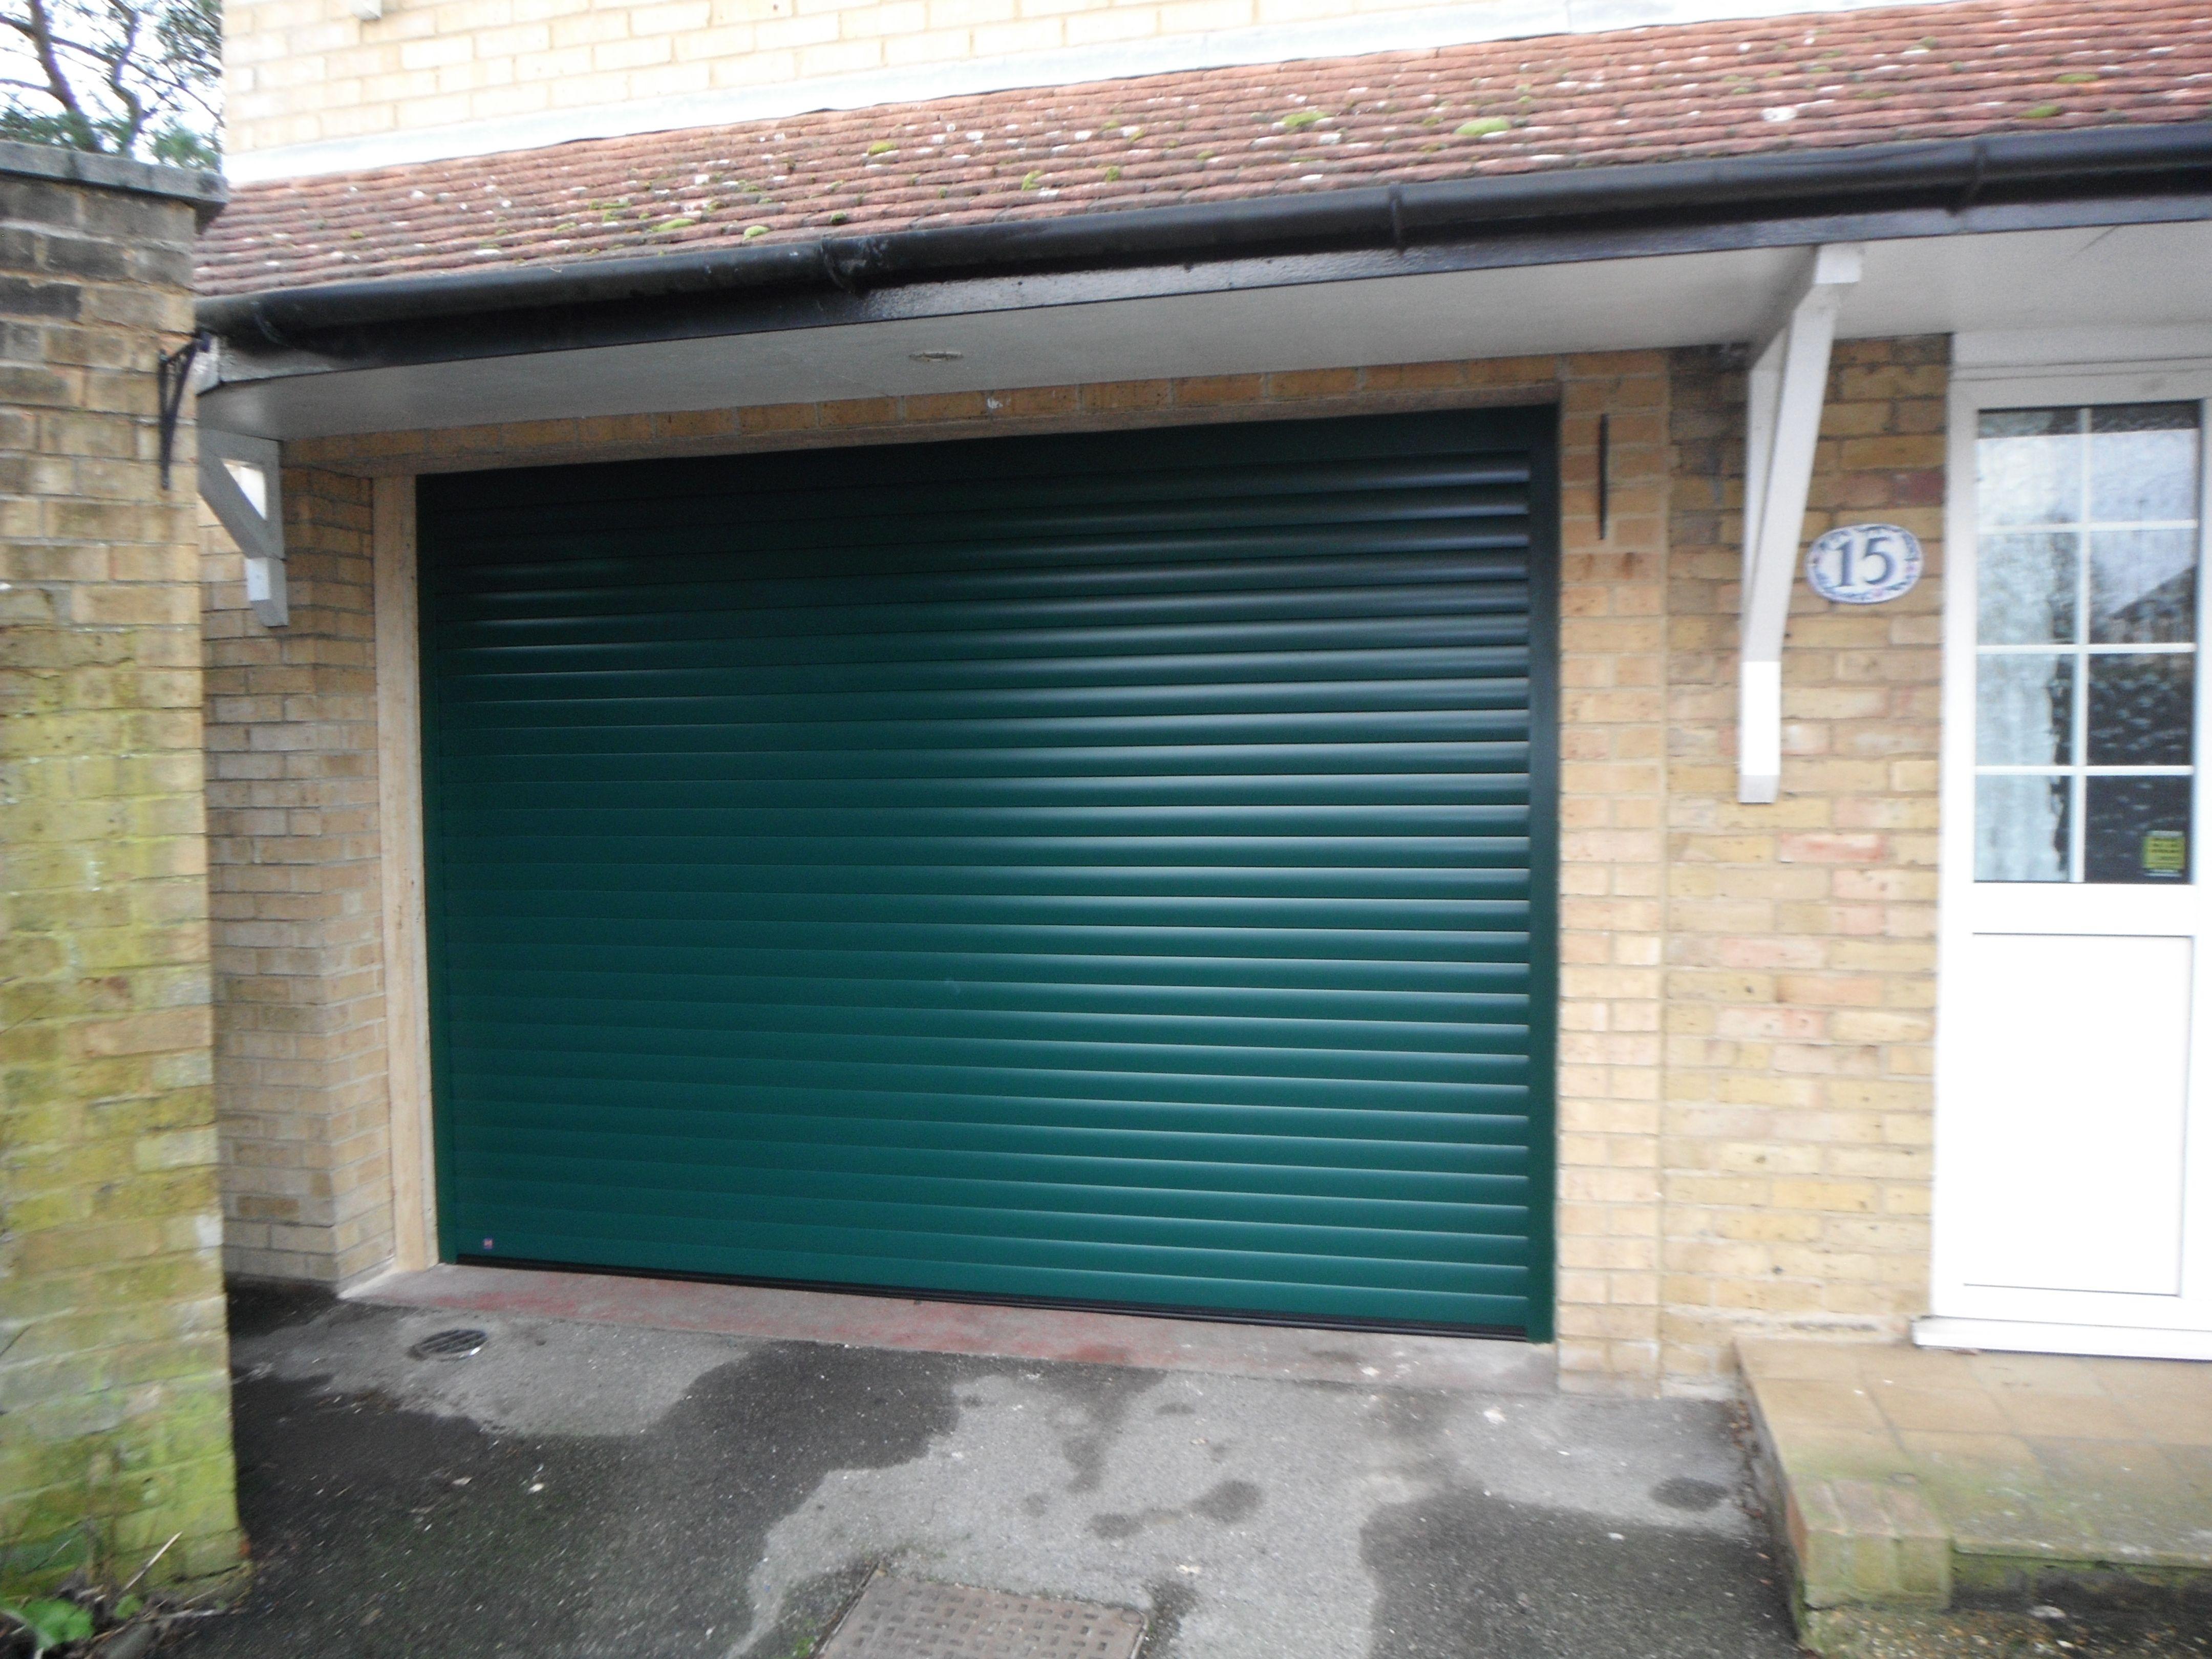 Hormann rollmatic garage door in moss green finish hormann hormann rollmatic garage door in moss green finish rubansaba